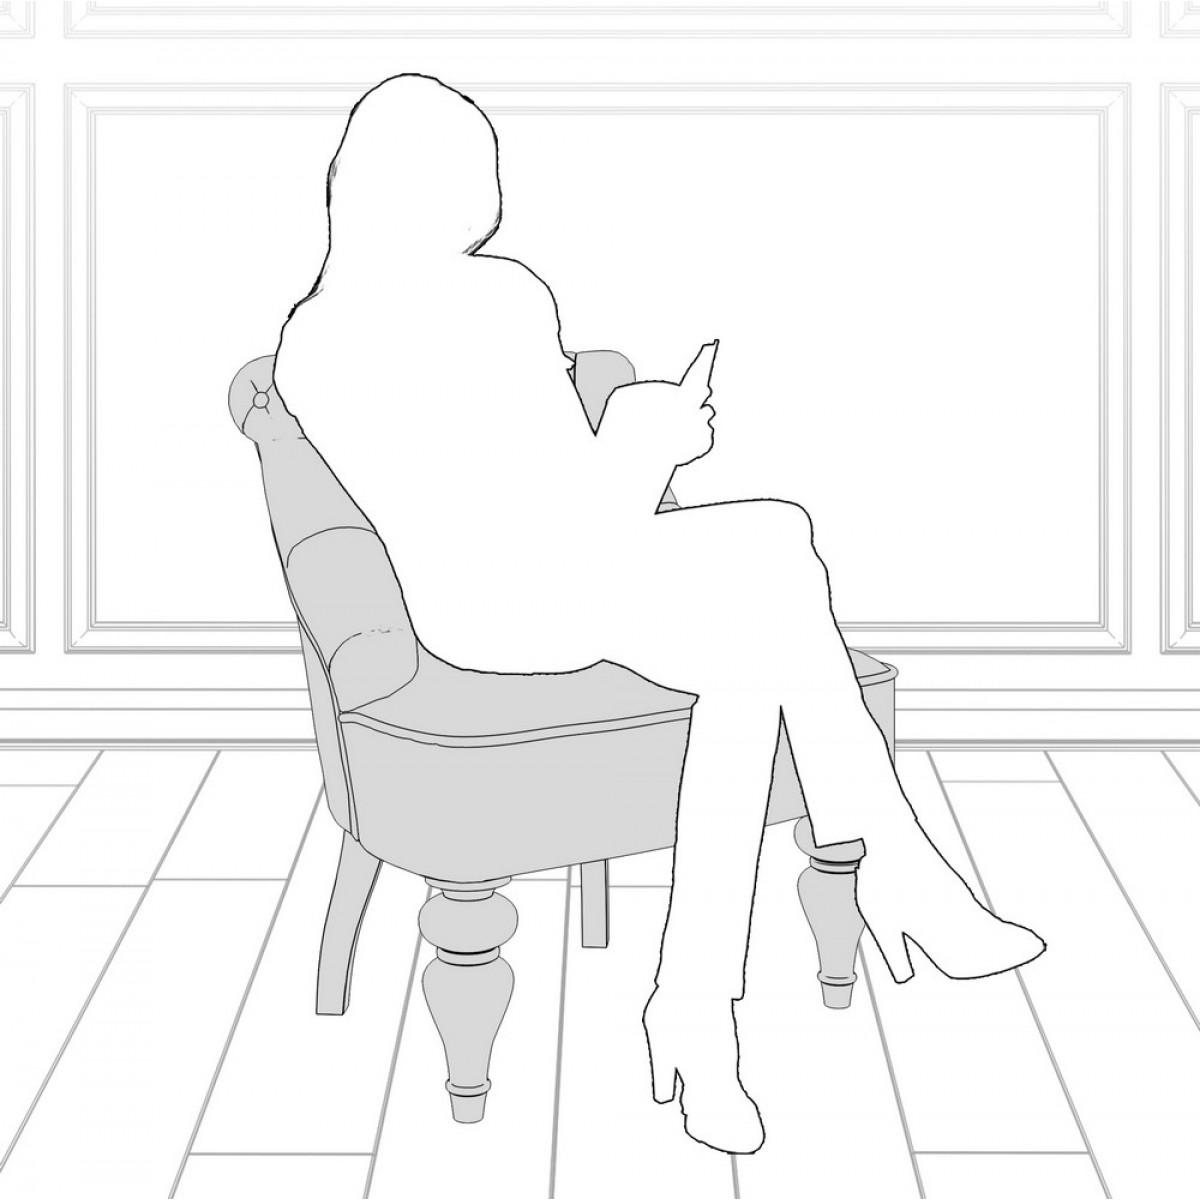 M13-W-B13 Кресло Крапо коллекция L'Atelier Du Meuble